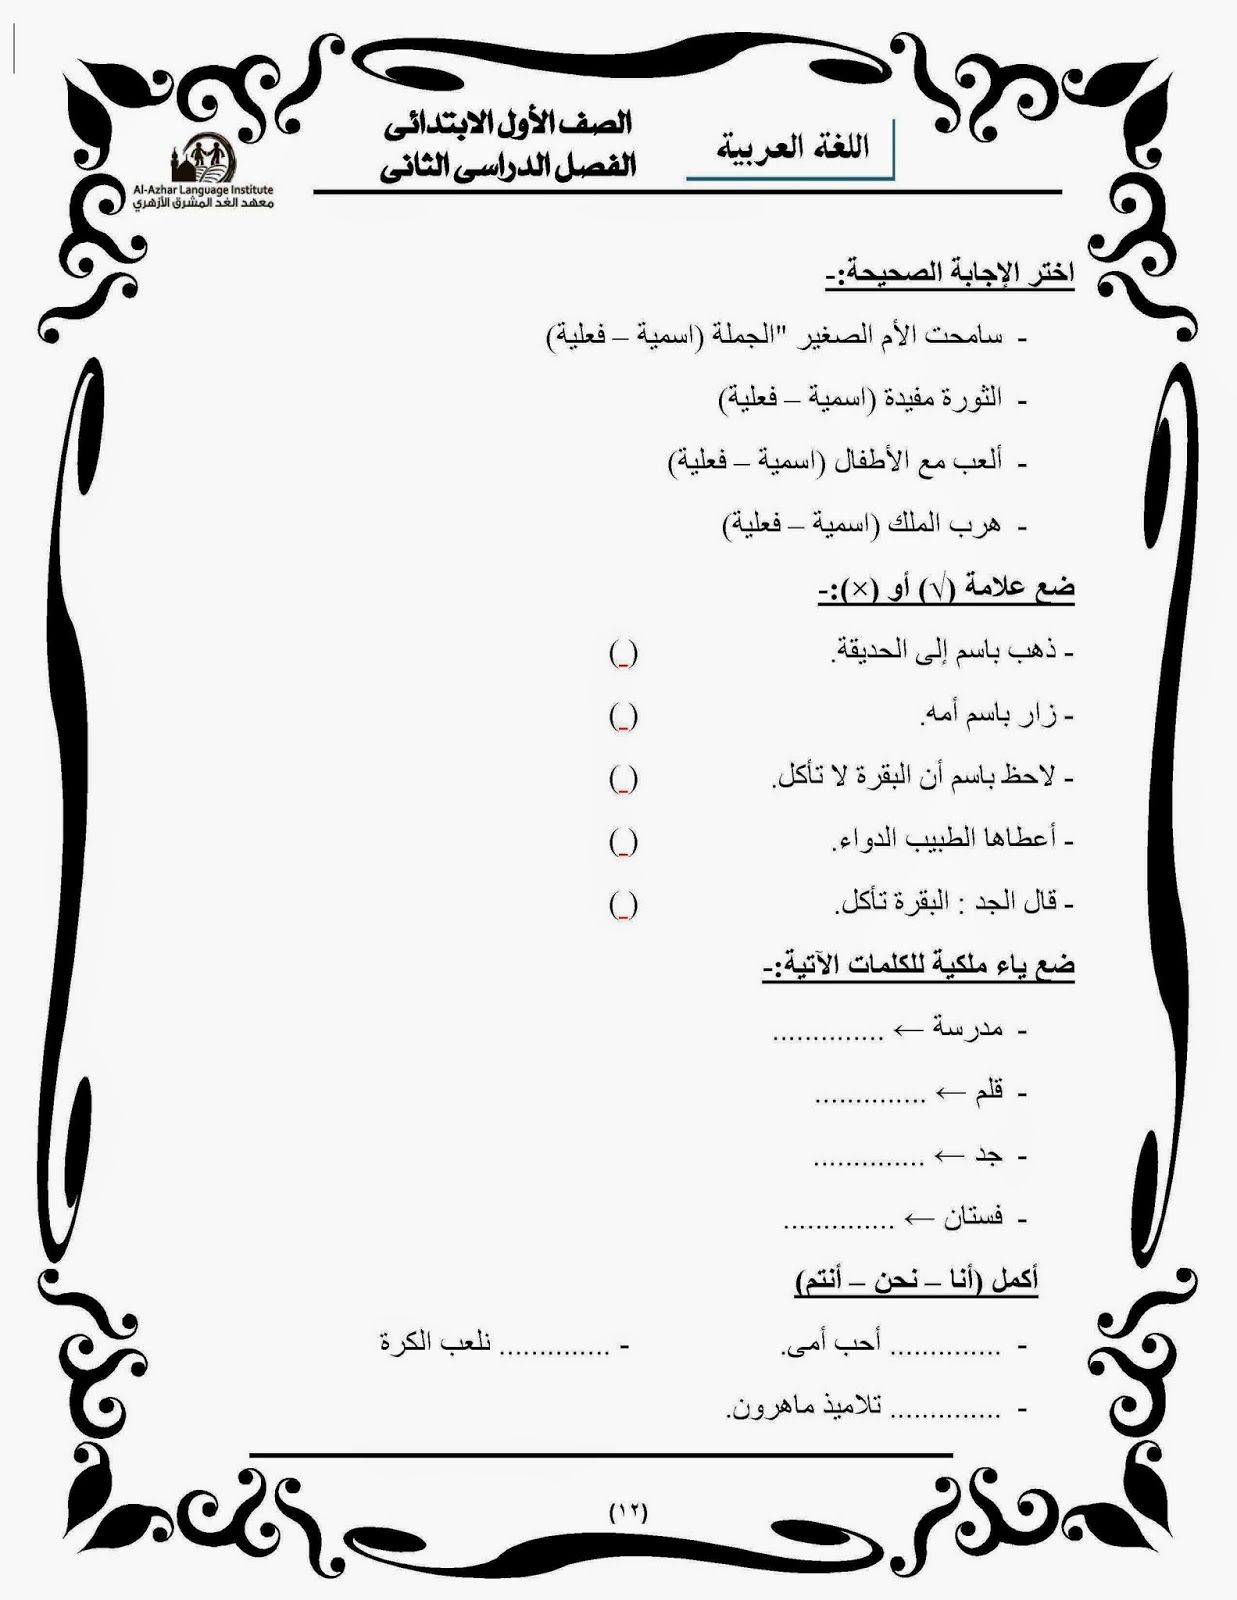 medium resolution of Urdu Grammar Worksheet Grade 1   Printable Worksheets and Activities for  Teachers